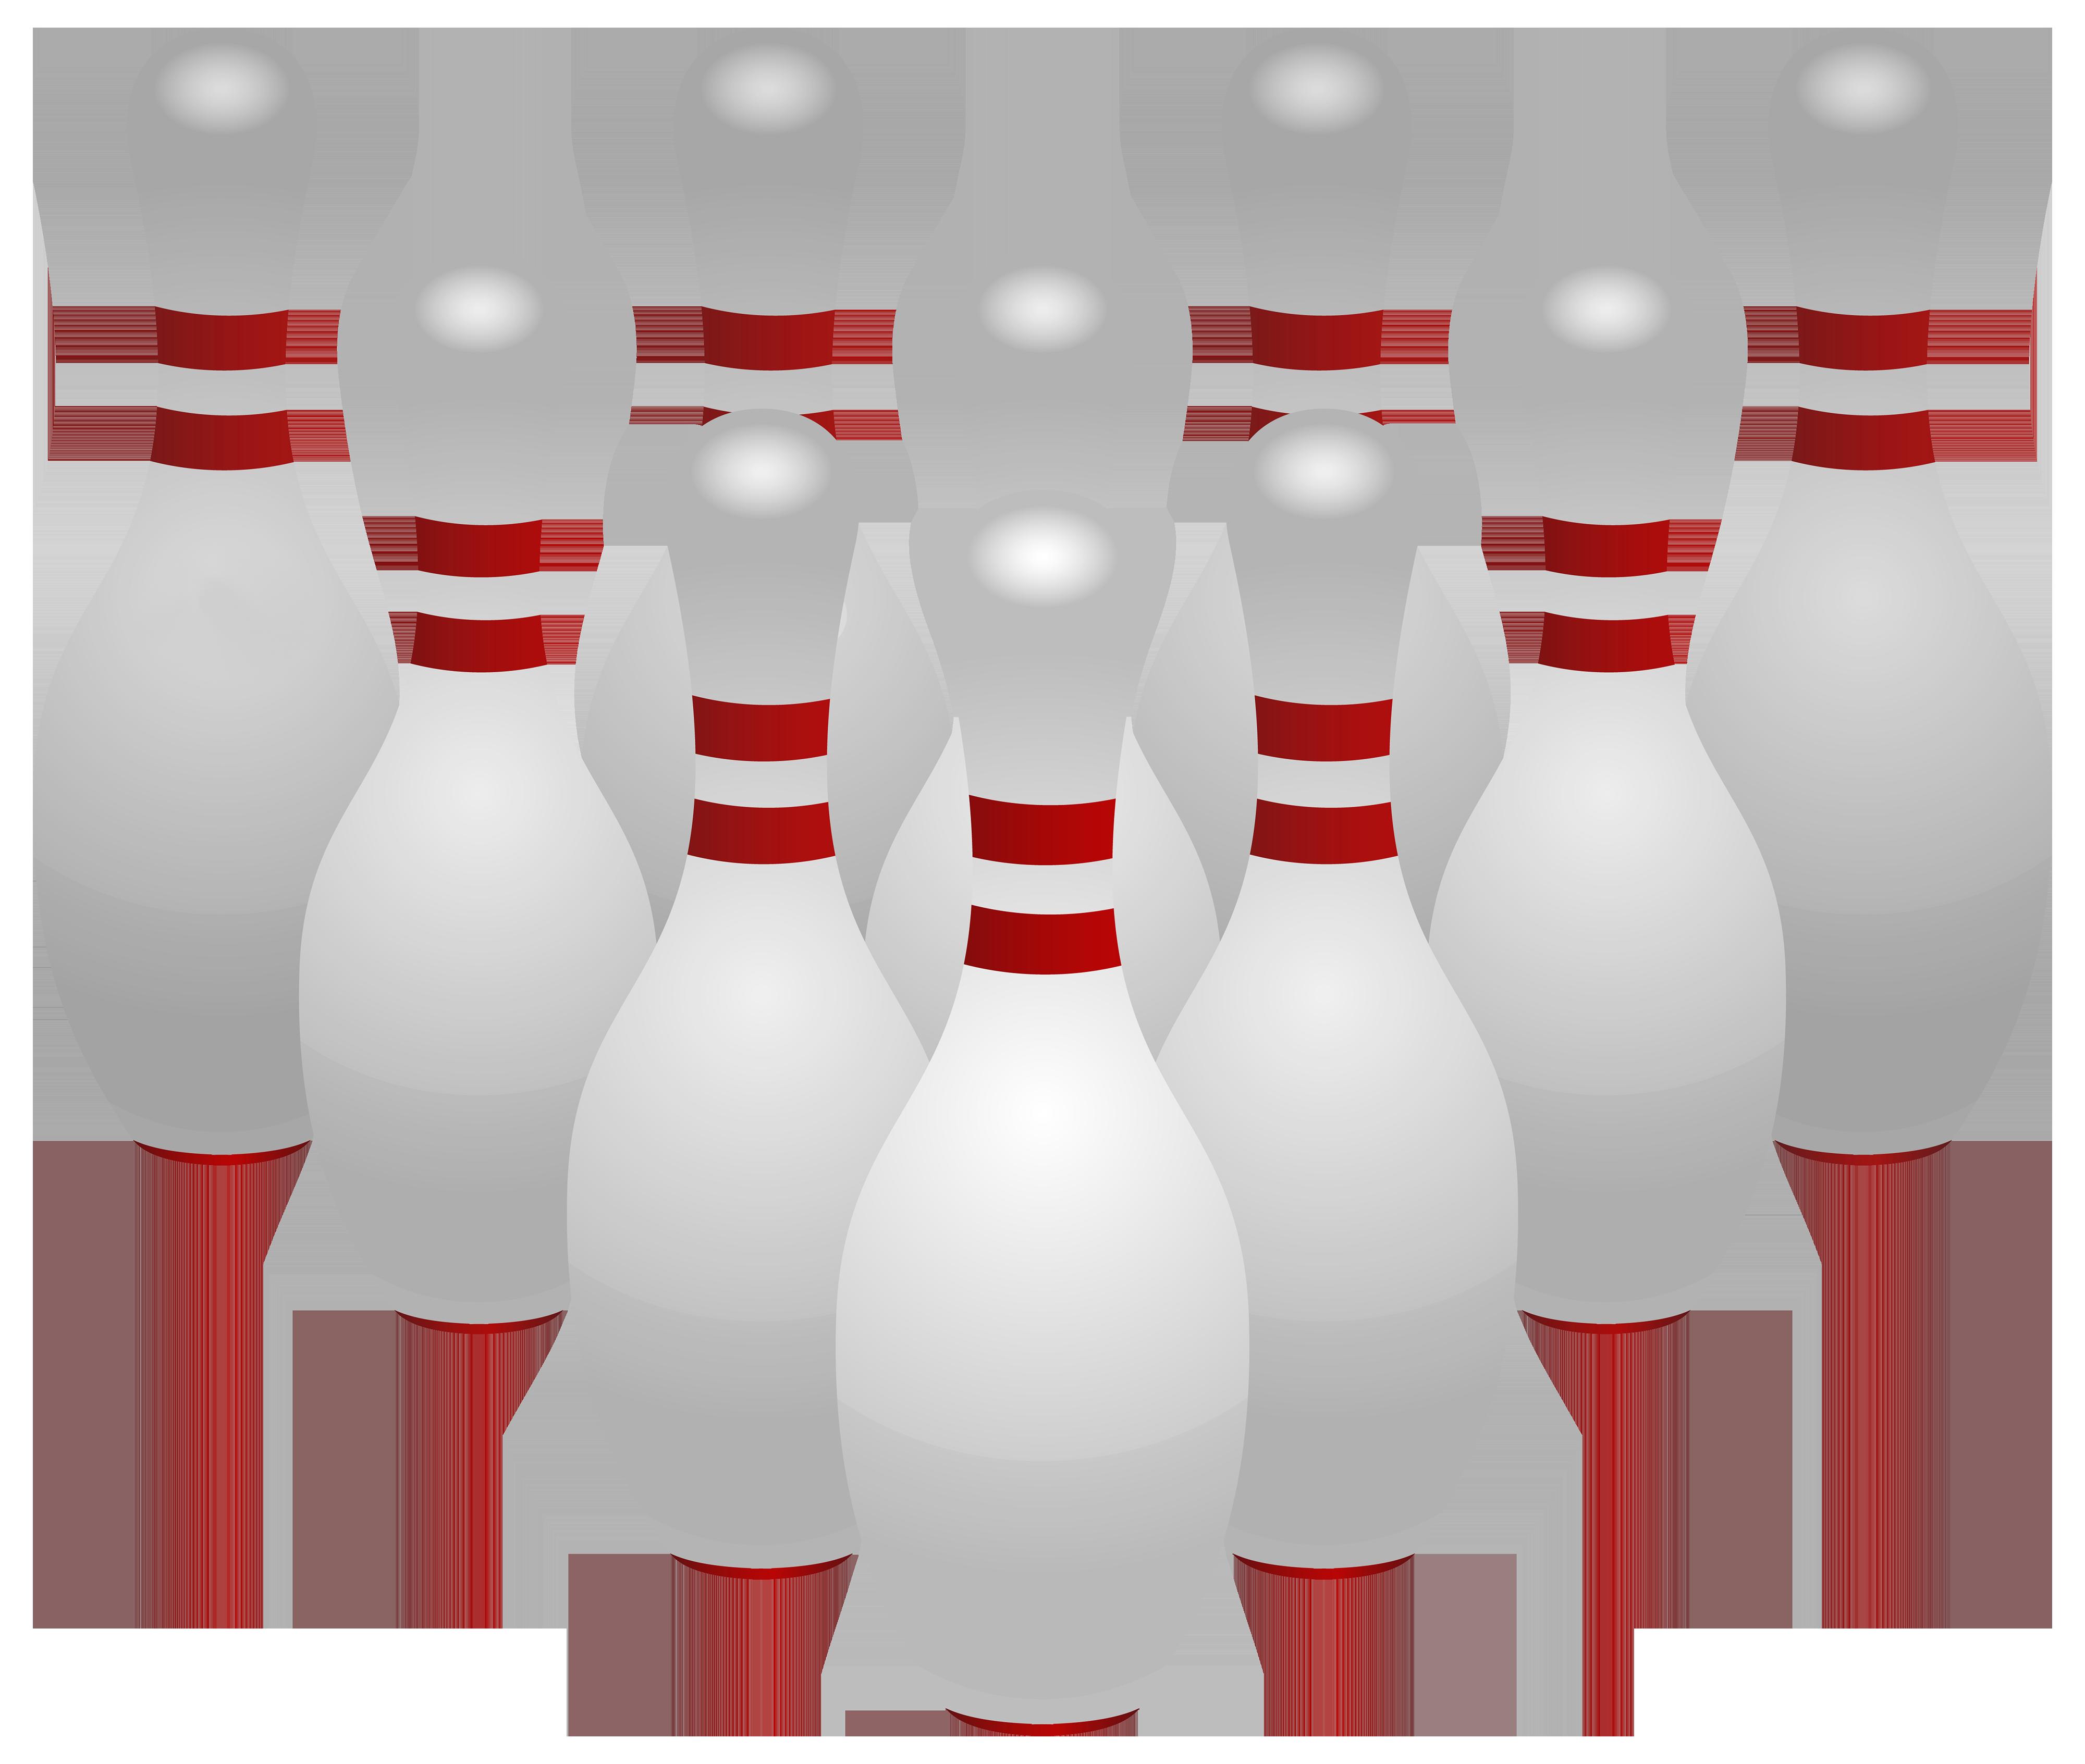 Bowling PNG - 275